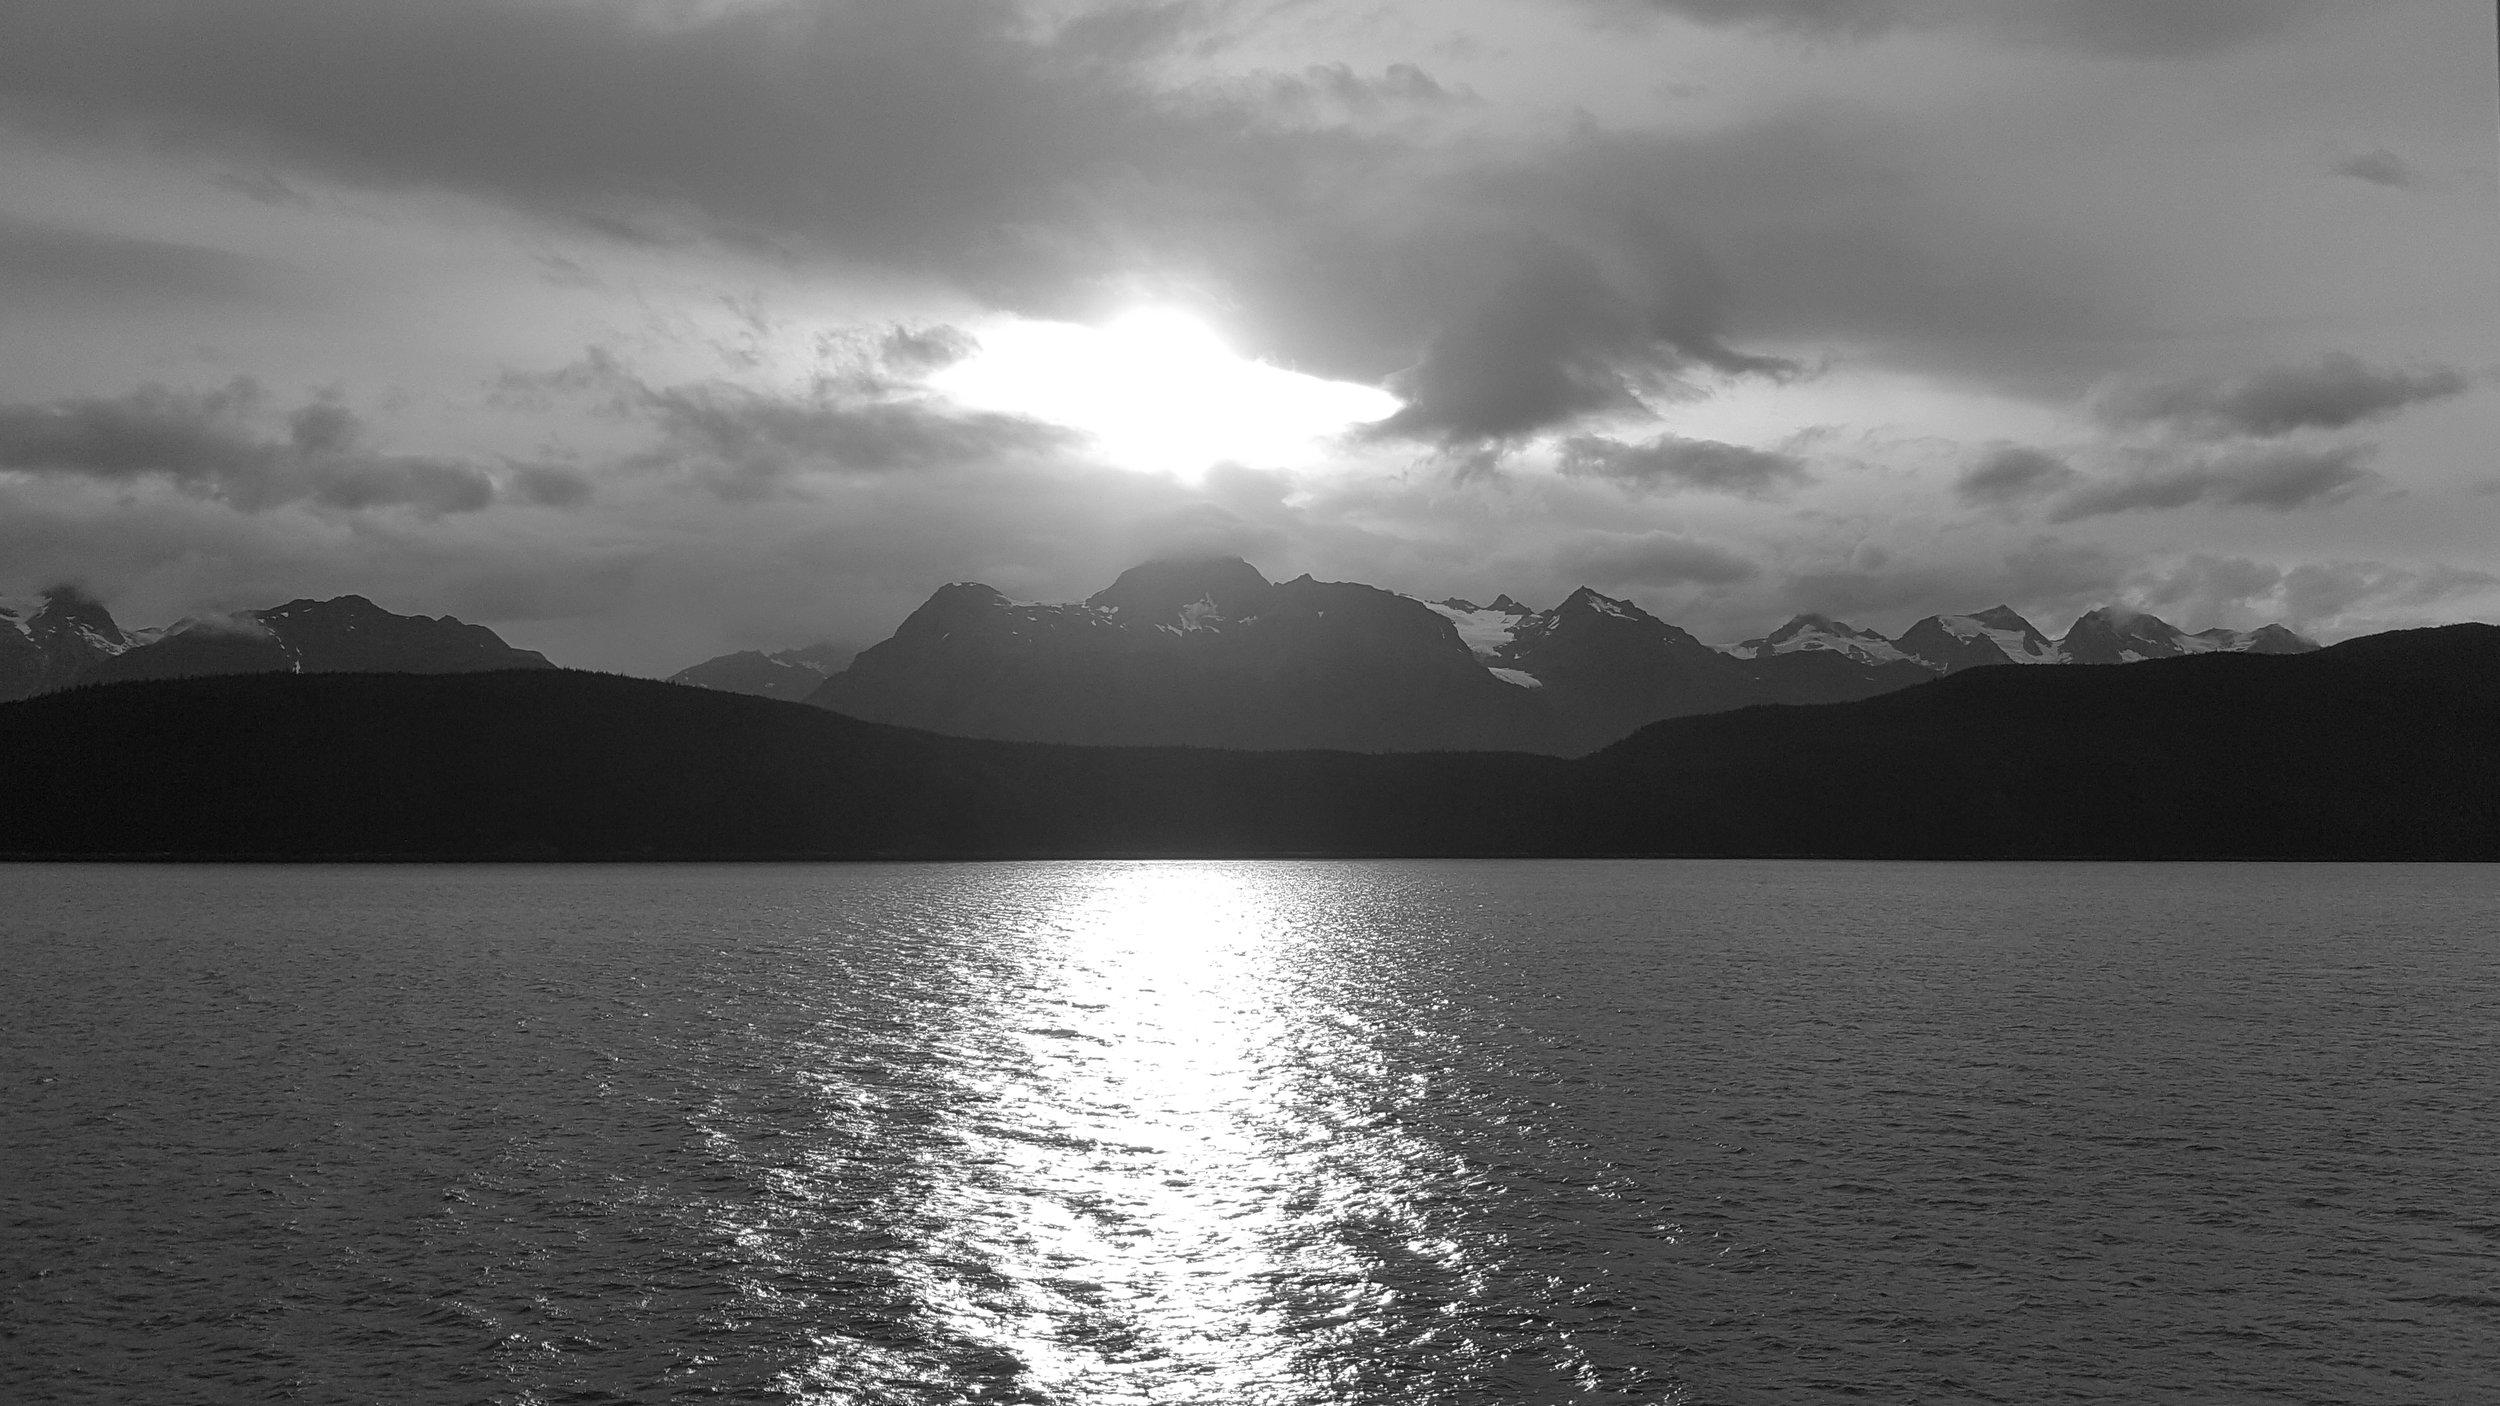 Photo Credit: Tina Gunn, Lost and Found in Alaska